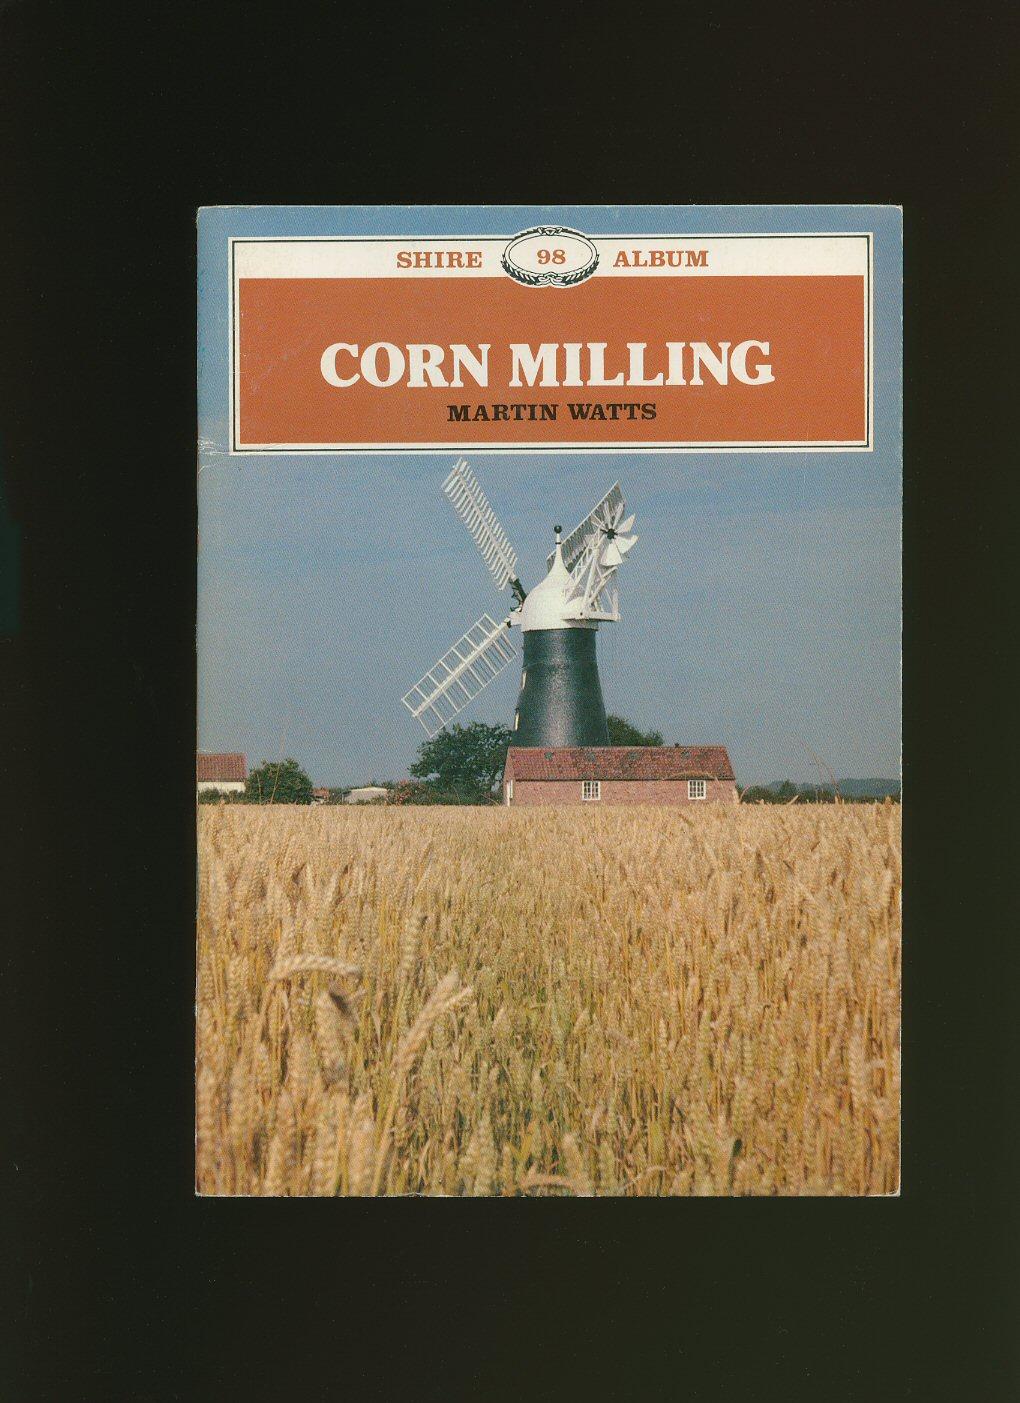 WATTS, MARTIN - Corn Milling [Shire Album Series No. 98]